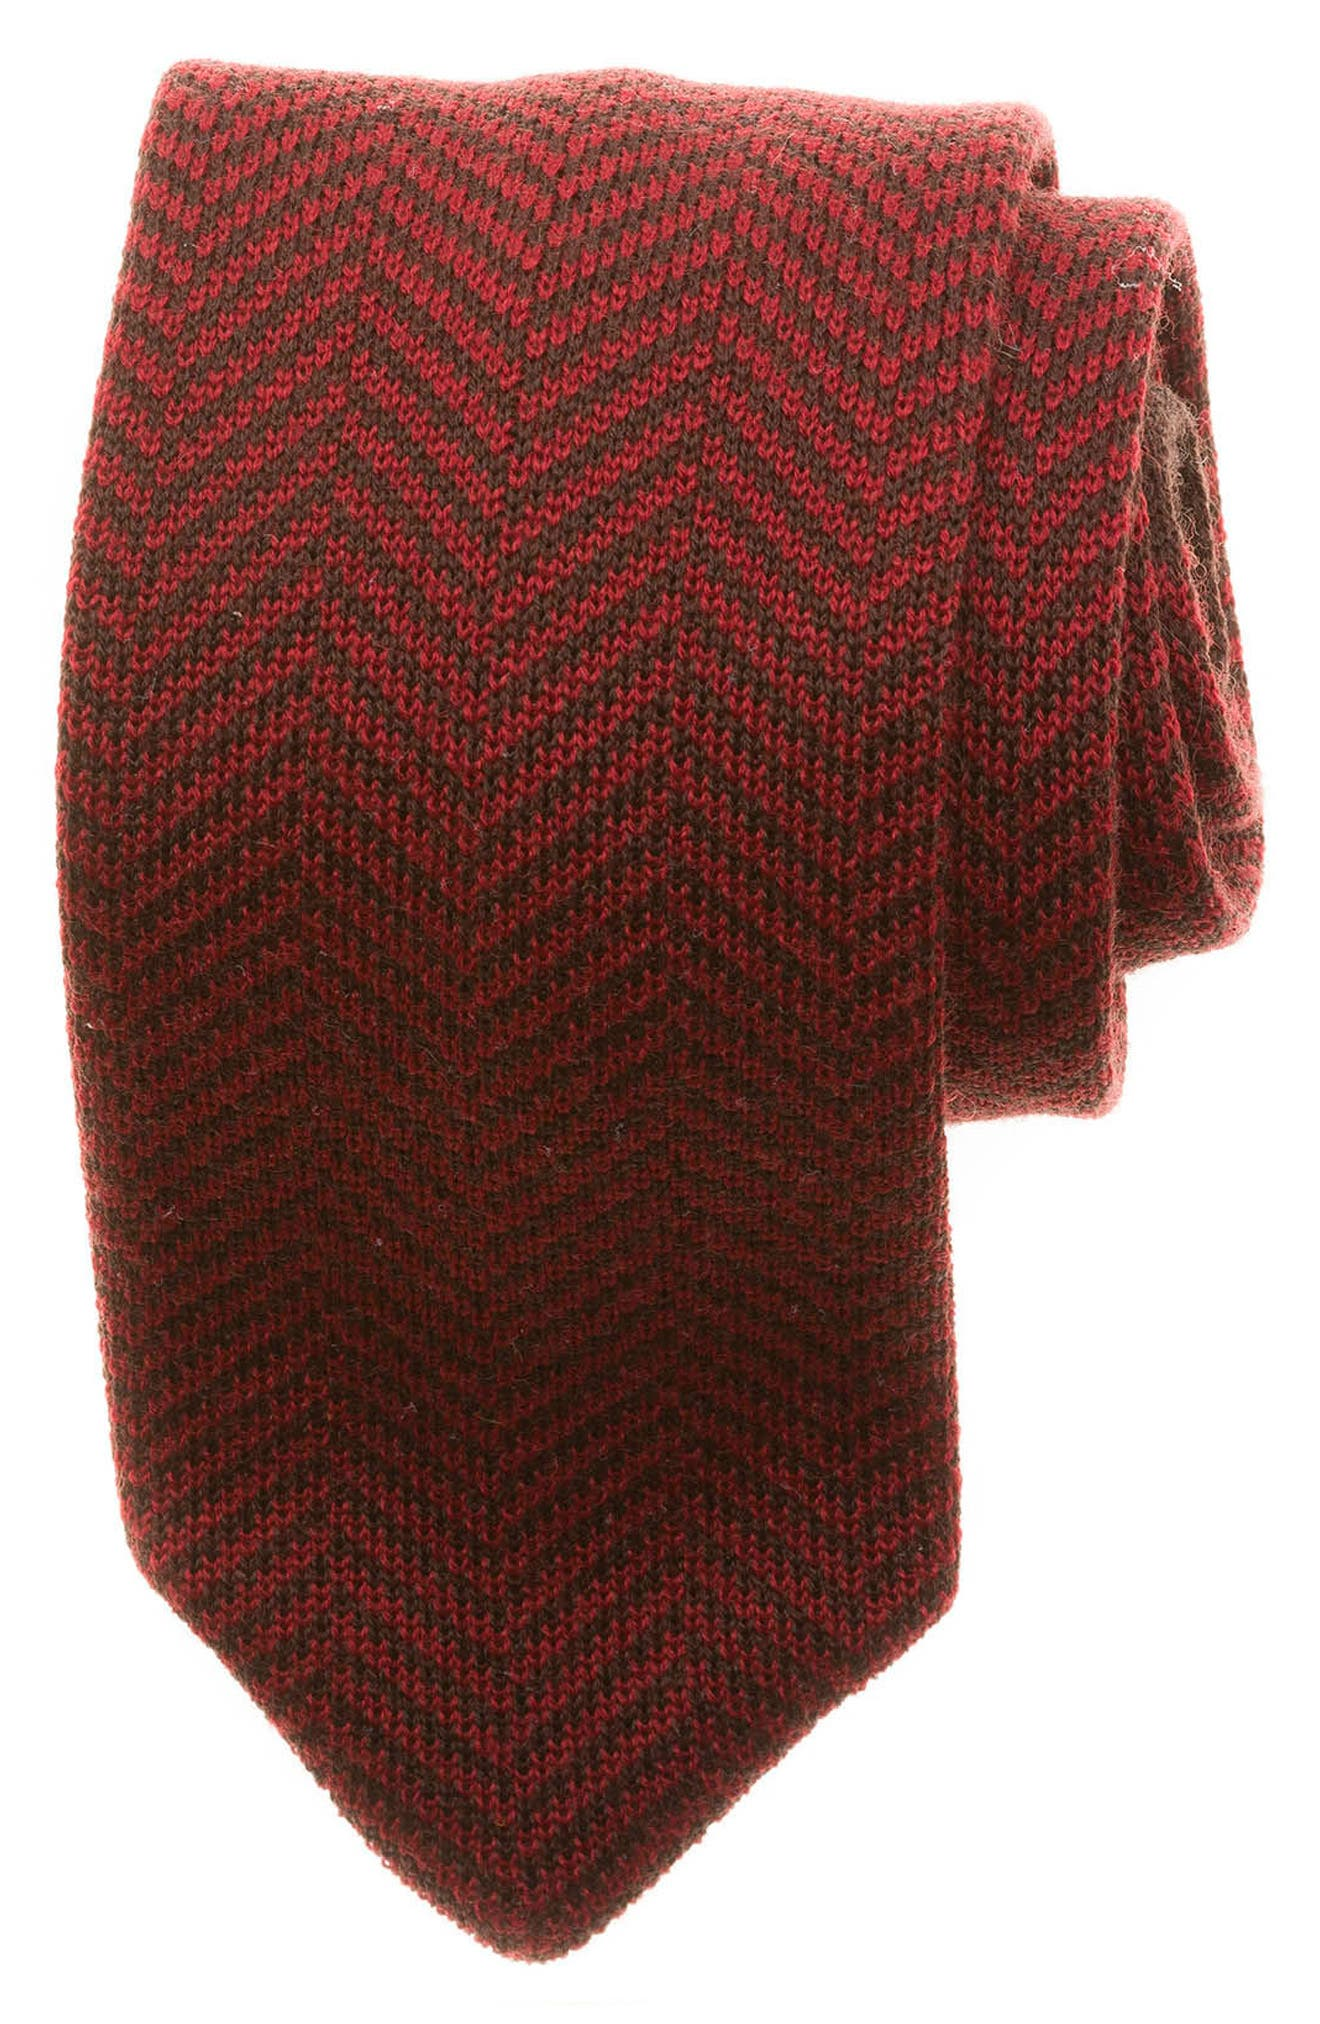 Herringbone Knit Wool Tie,                             Main thumbnail 1, color,                             RED